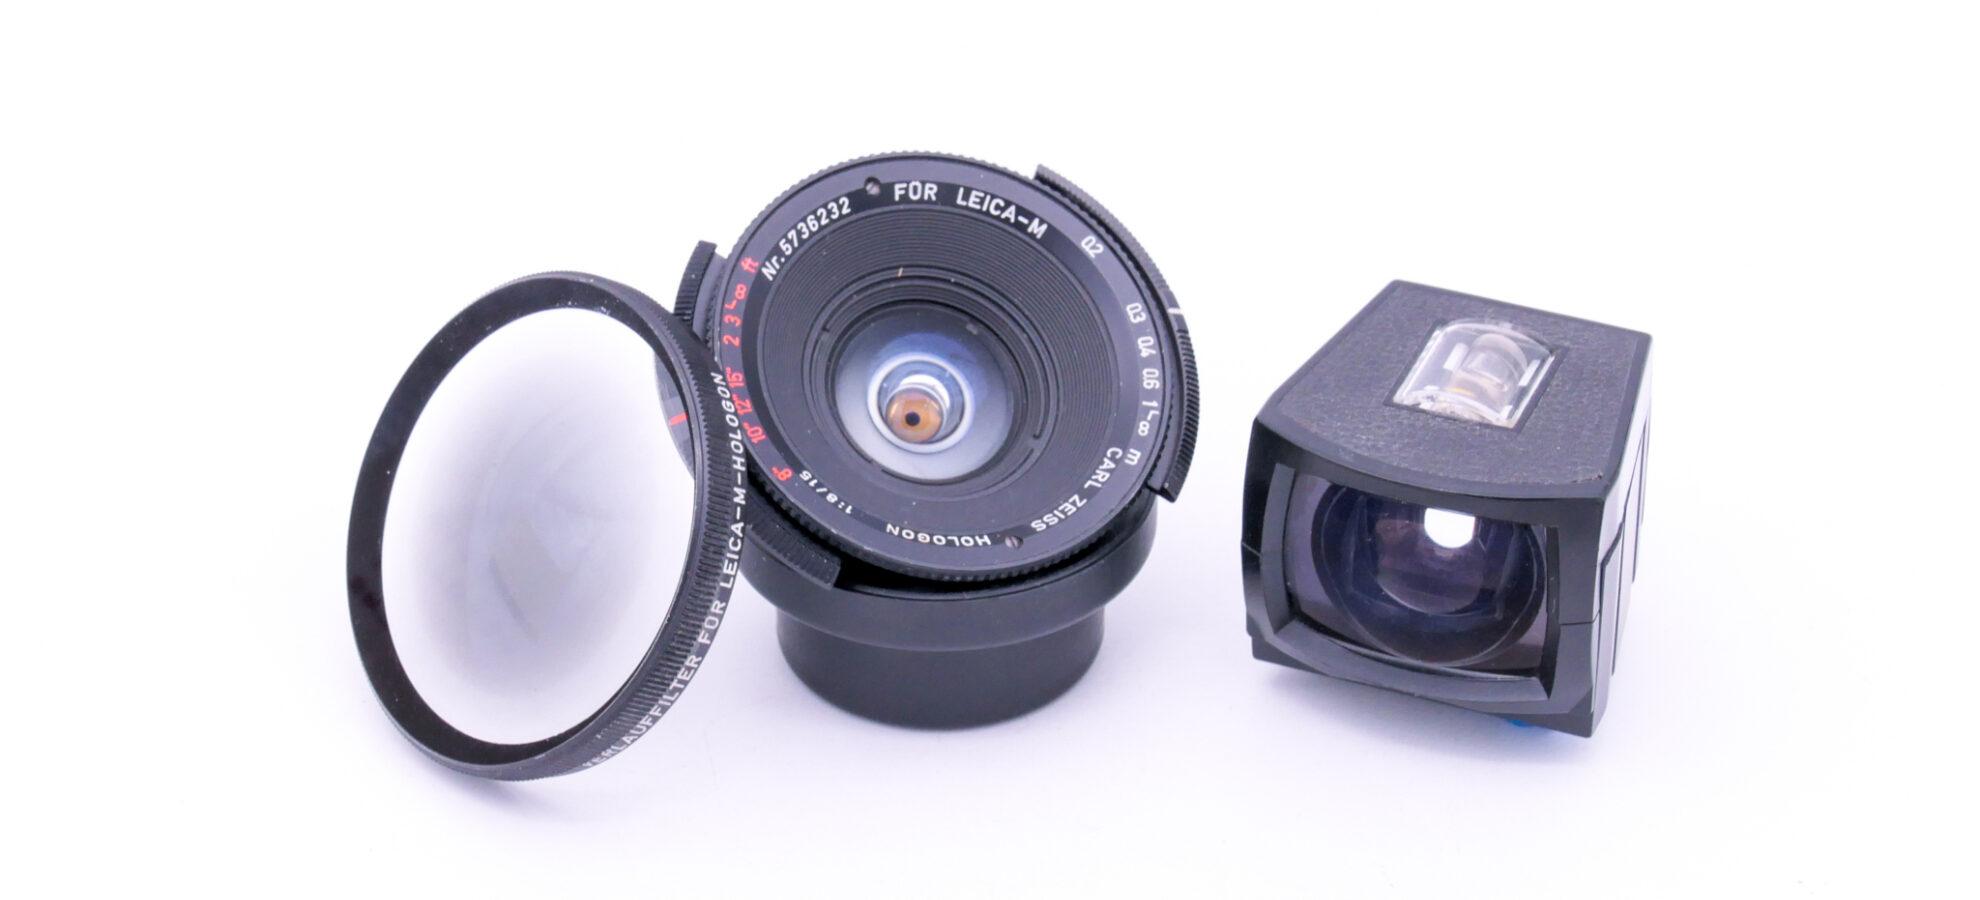 L1009107-2.jpg